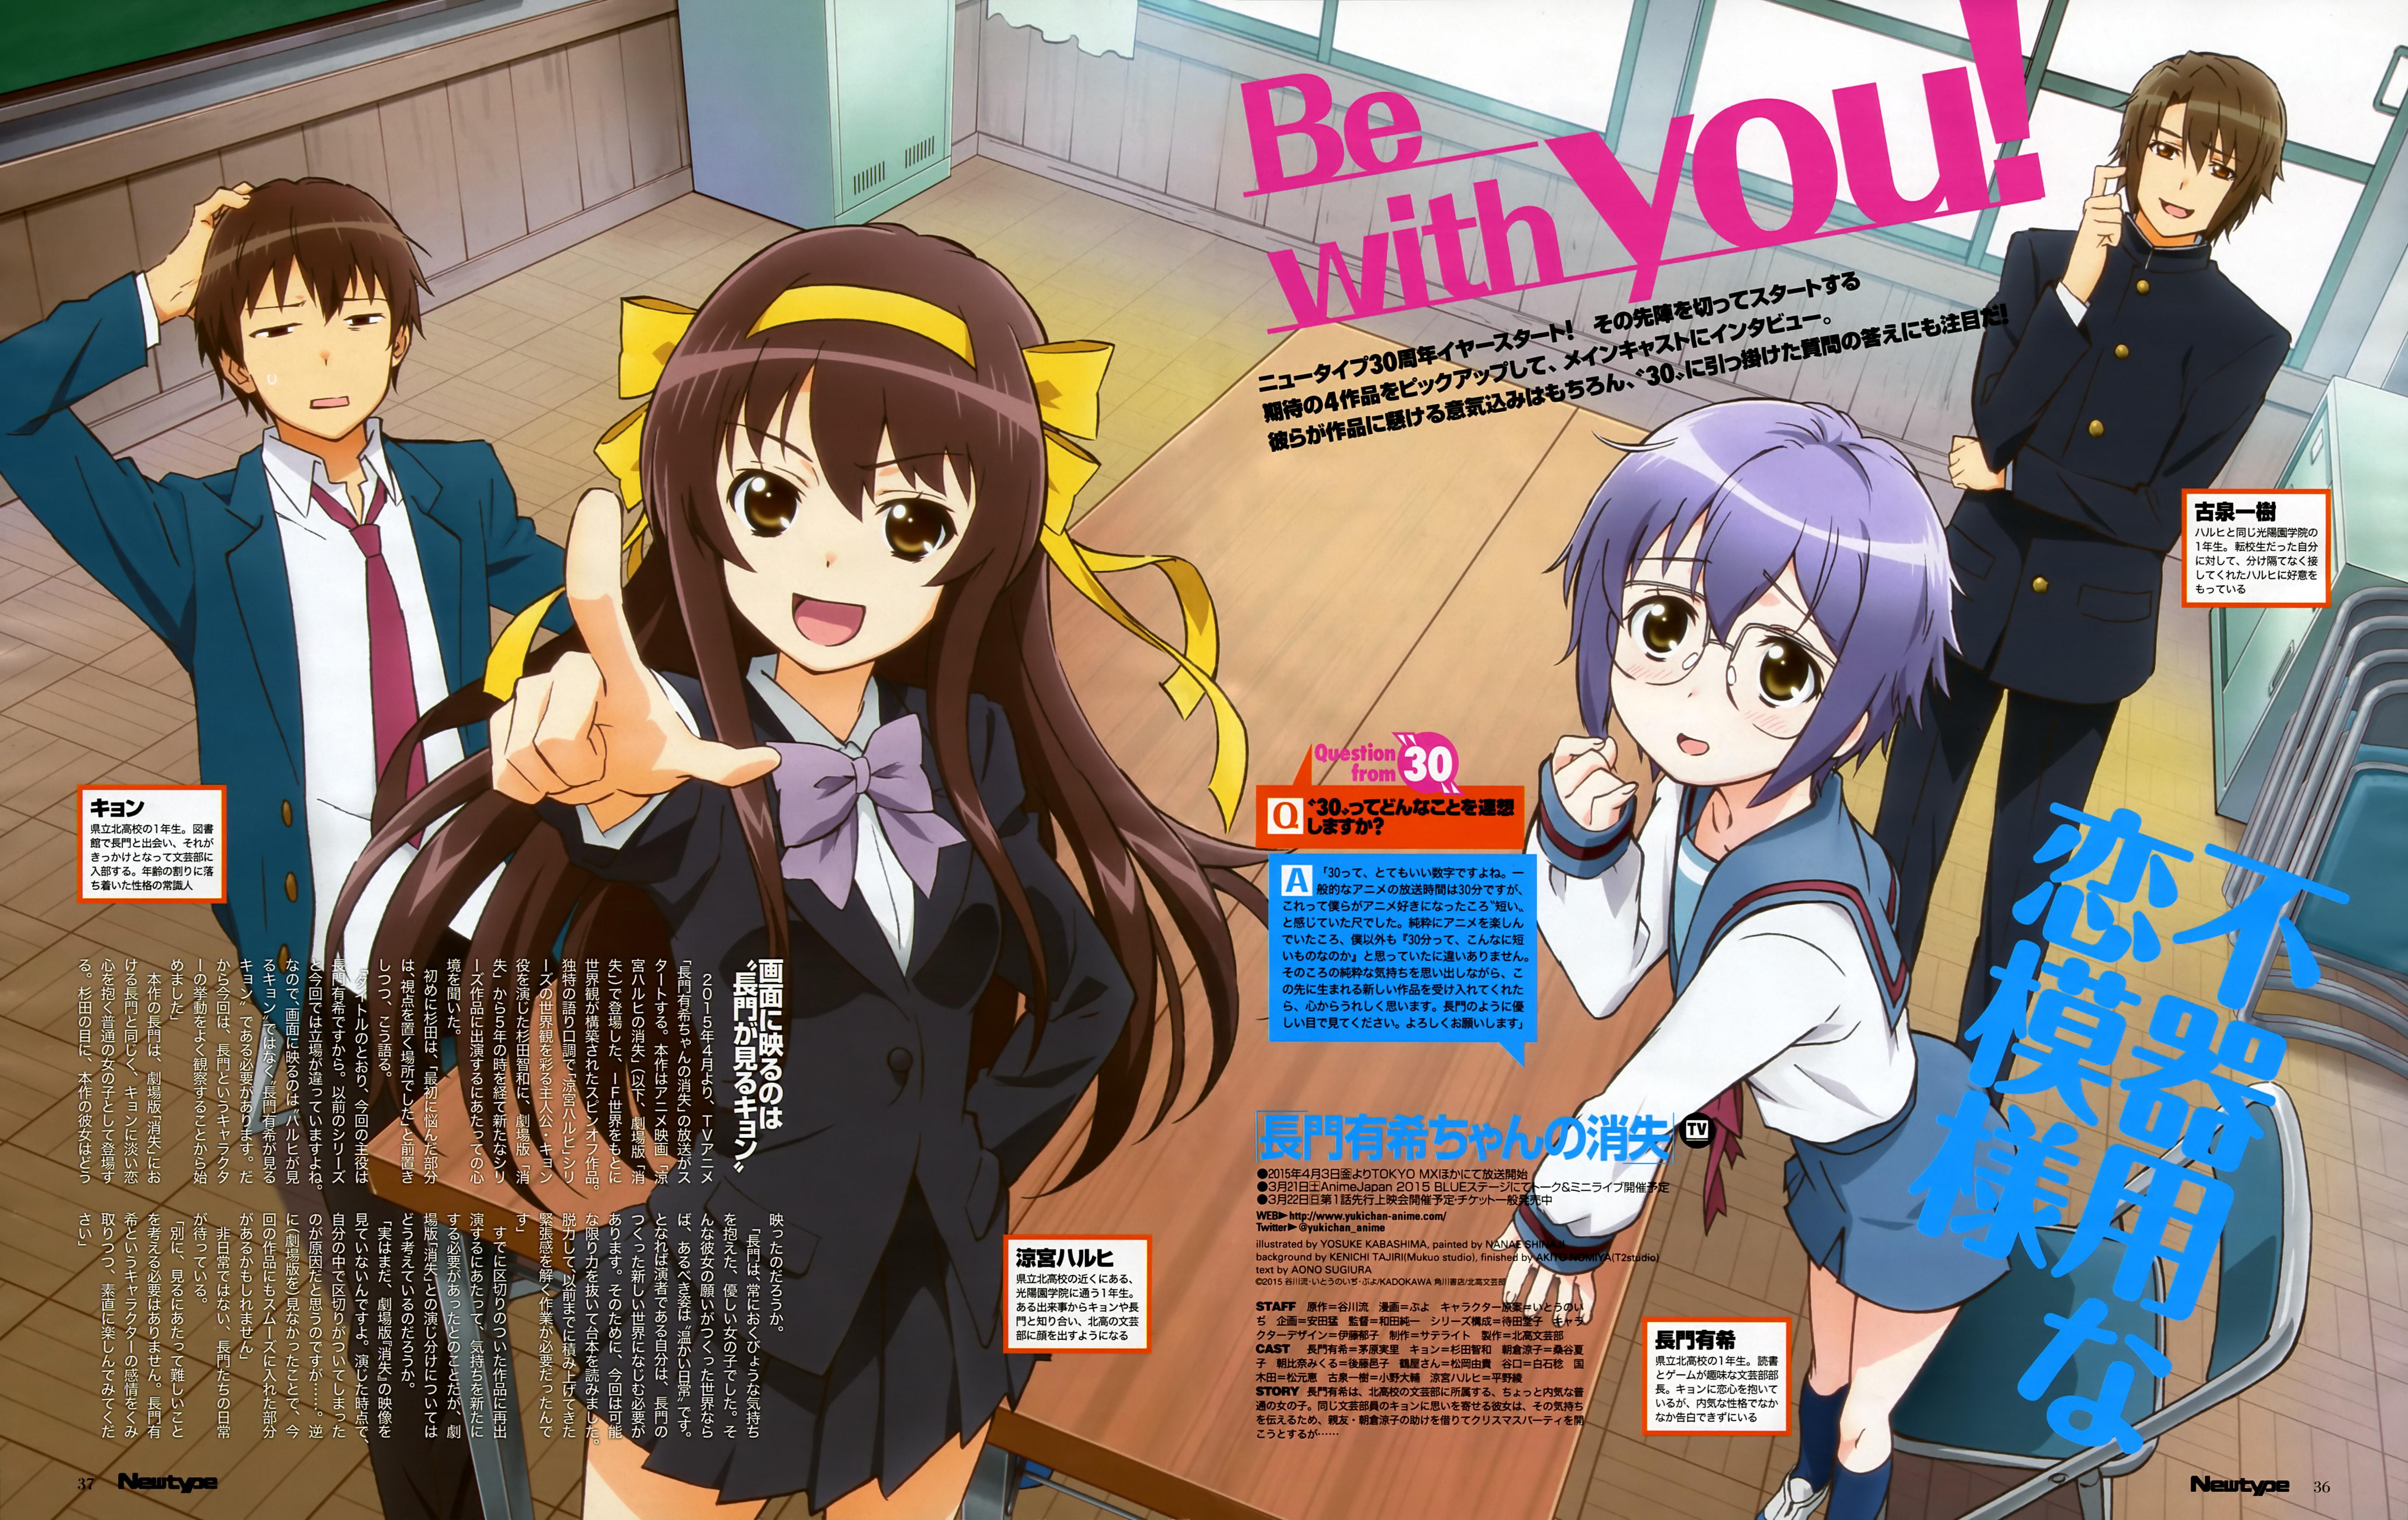 The-Disappearance-of-Nagato-Yuki-Chan-Anime-Magazine-Visual-4